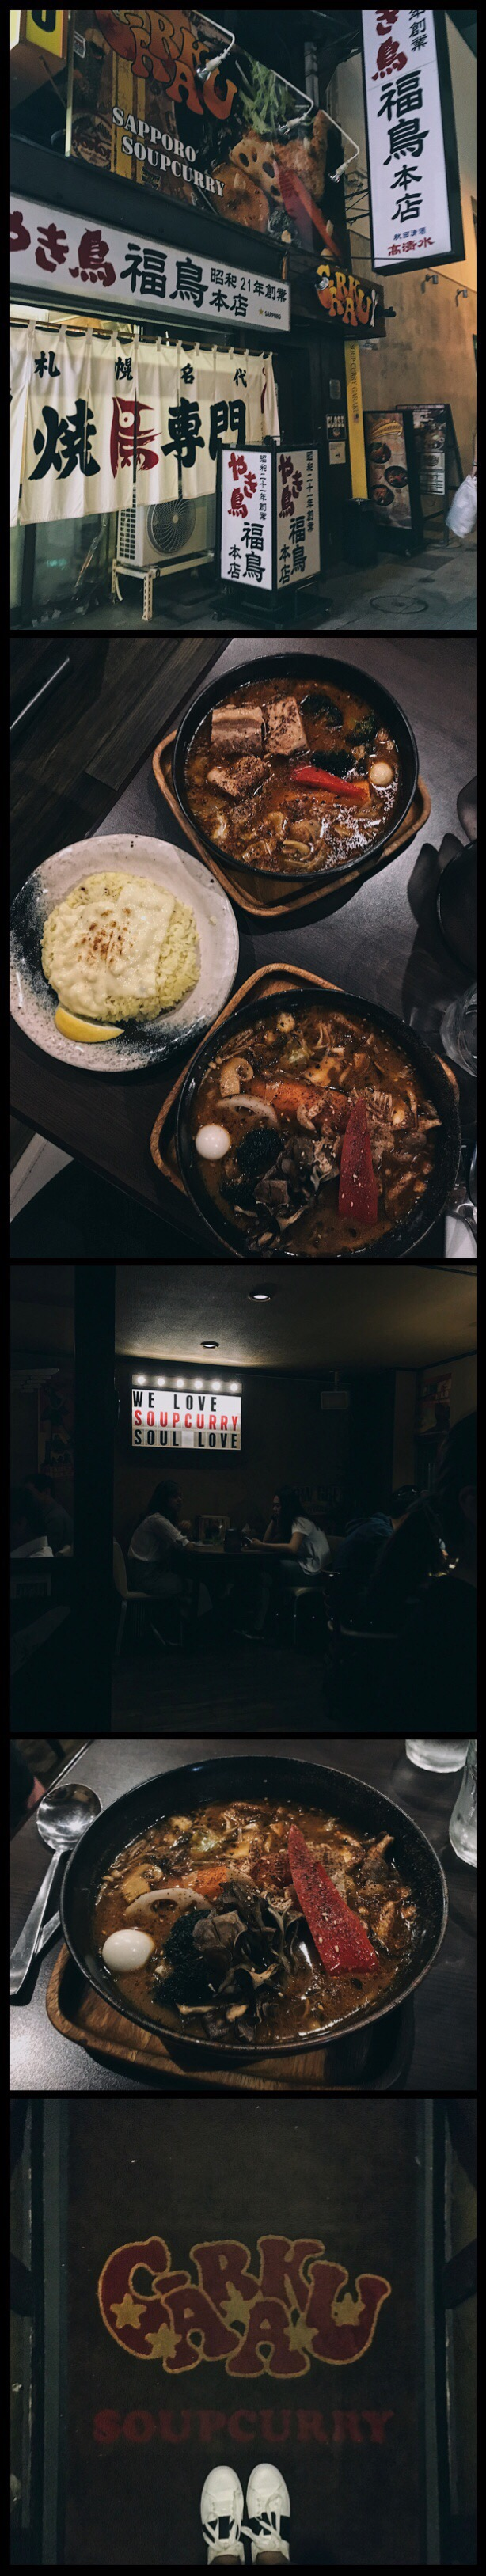 Garaku Soup Curry Sapporo Food